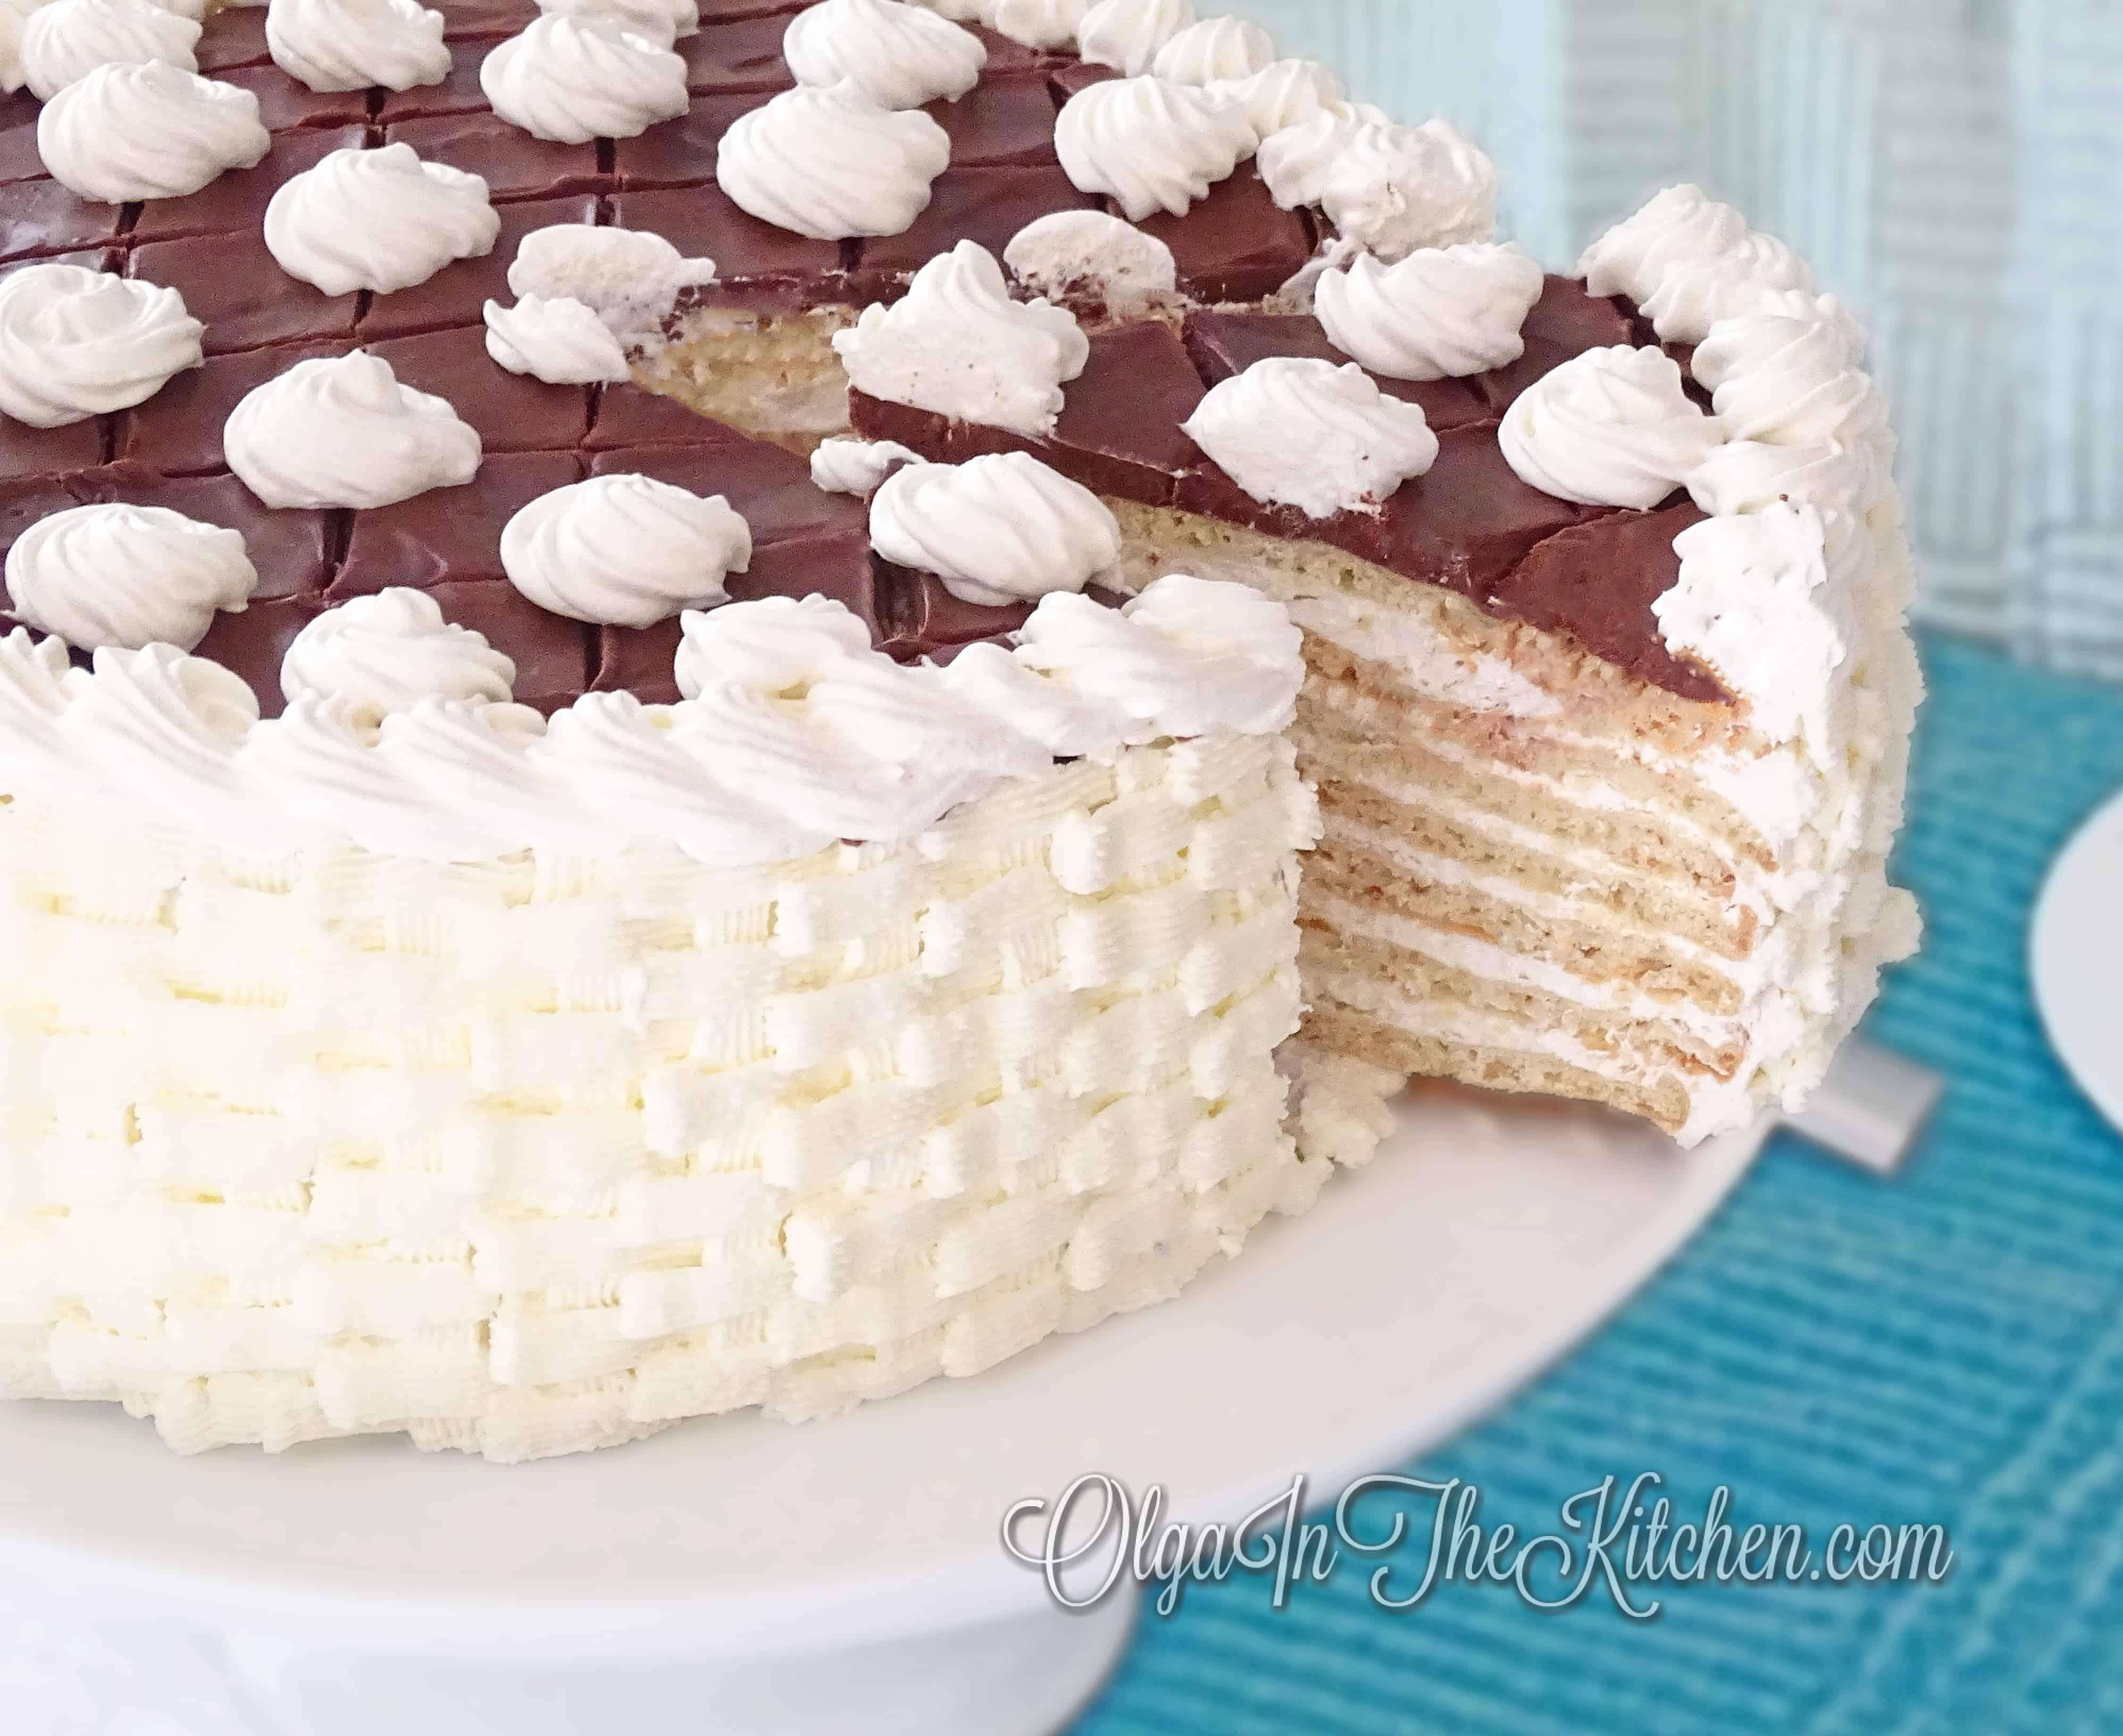 Ammonia White Cake with Sour Cream Frosting: dry cake layers creamed with sour cream frosting, topped with chocolate ganache. | olgainthekitchen.com